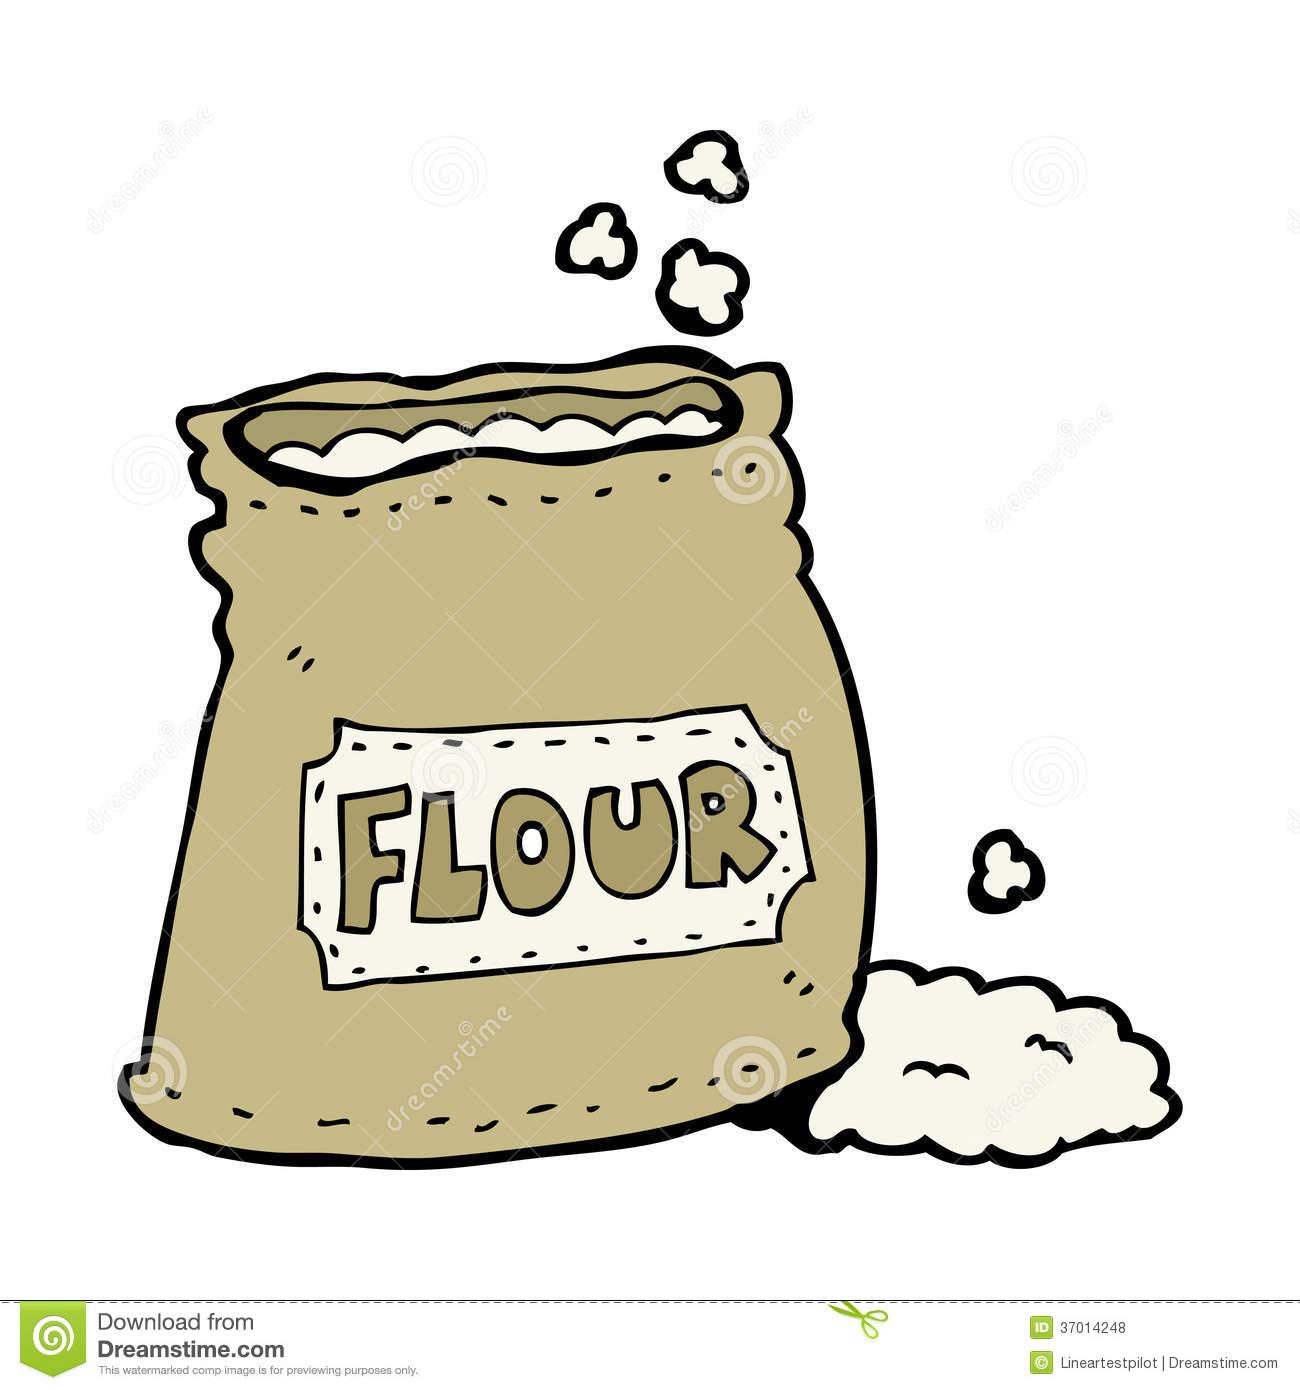 Flour Clipart; Flour Clipart; Flour Clipart; Flour Clipart